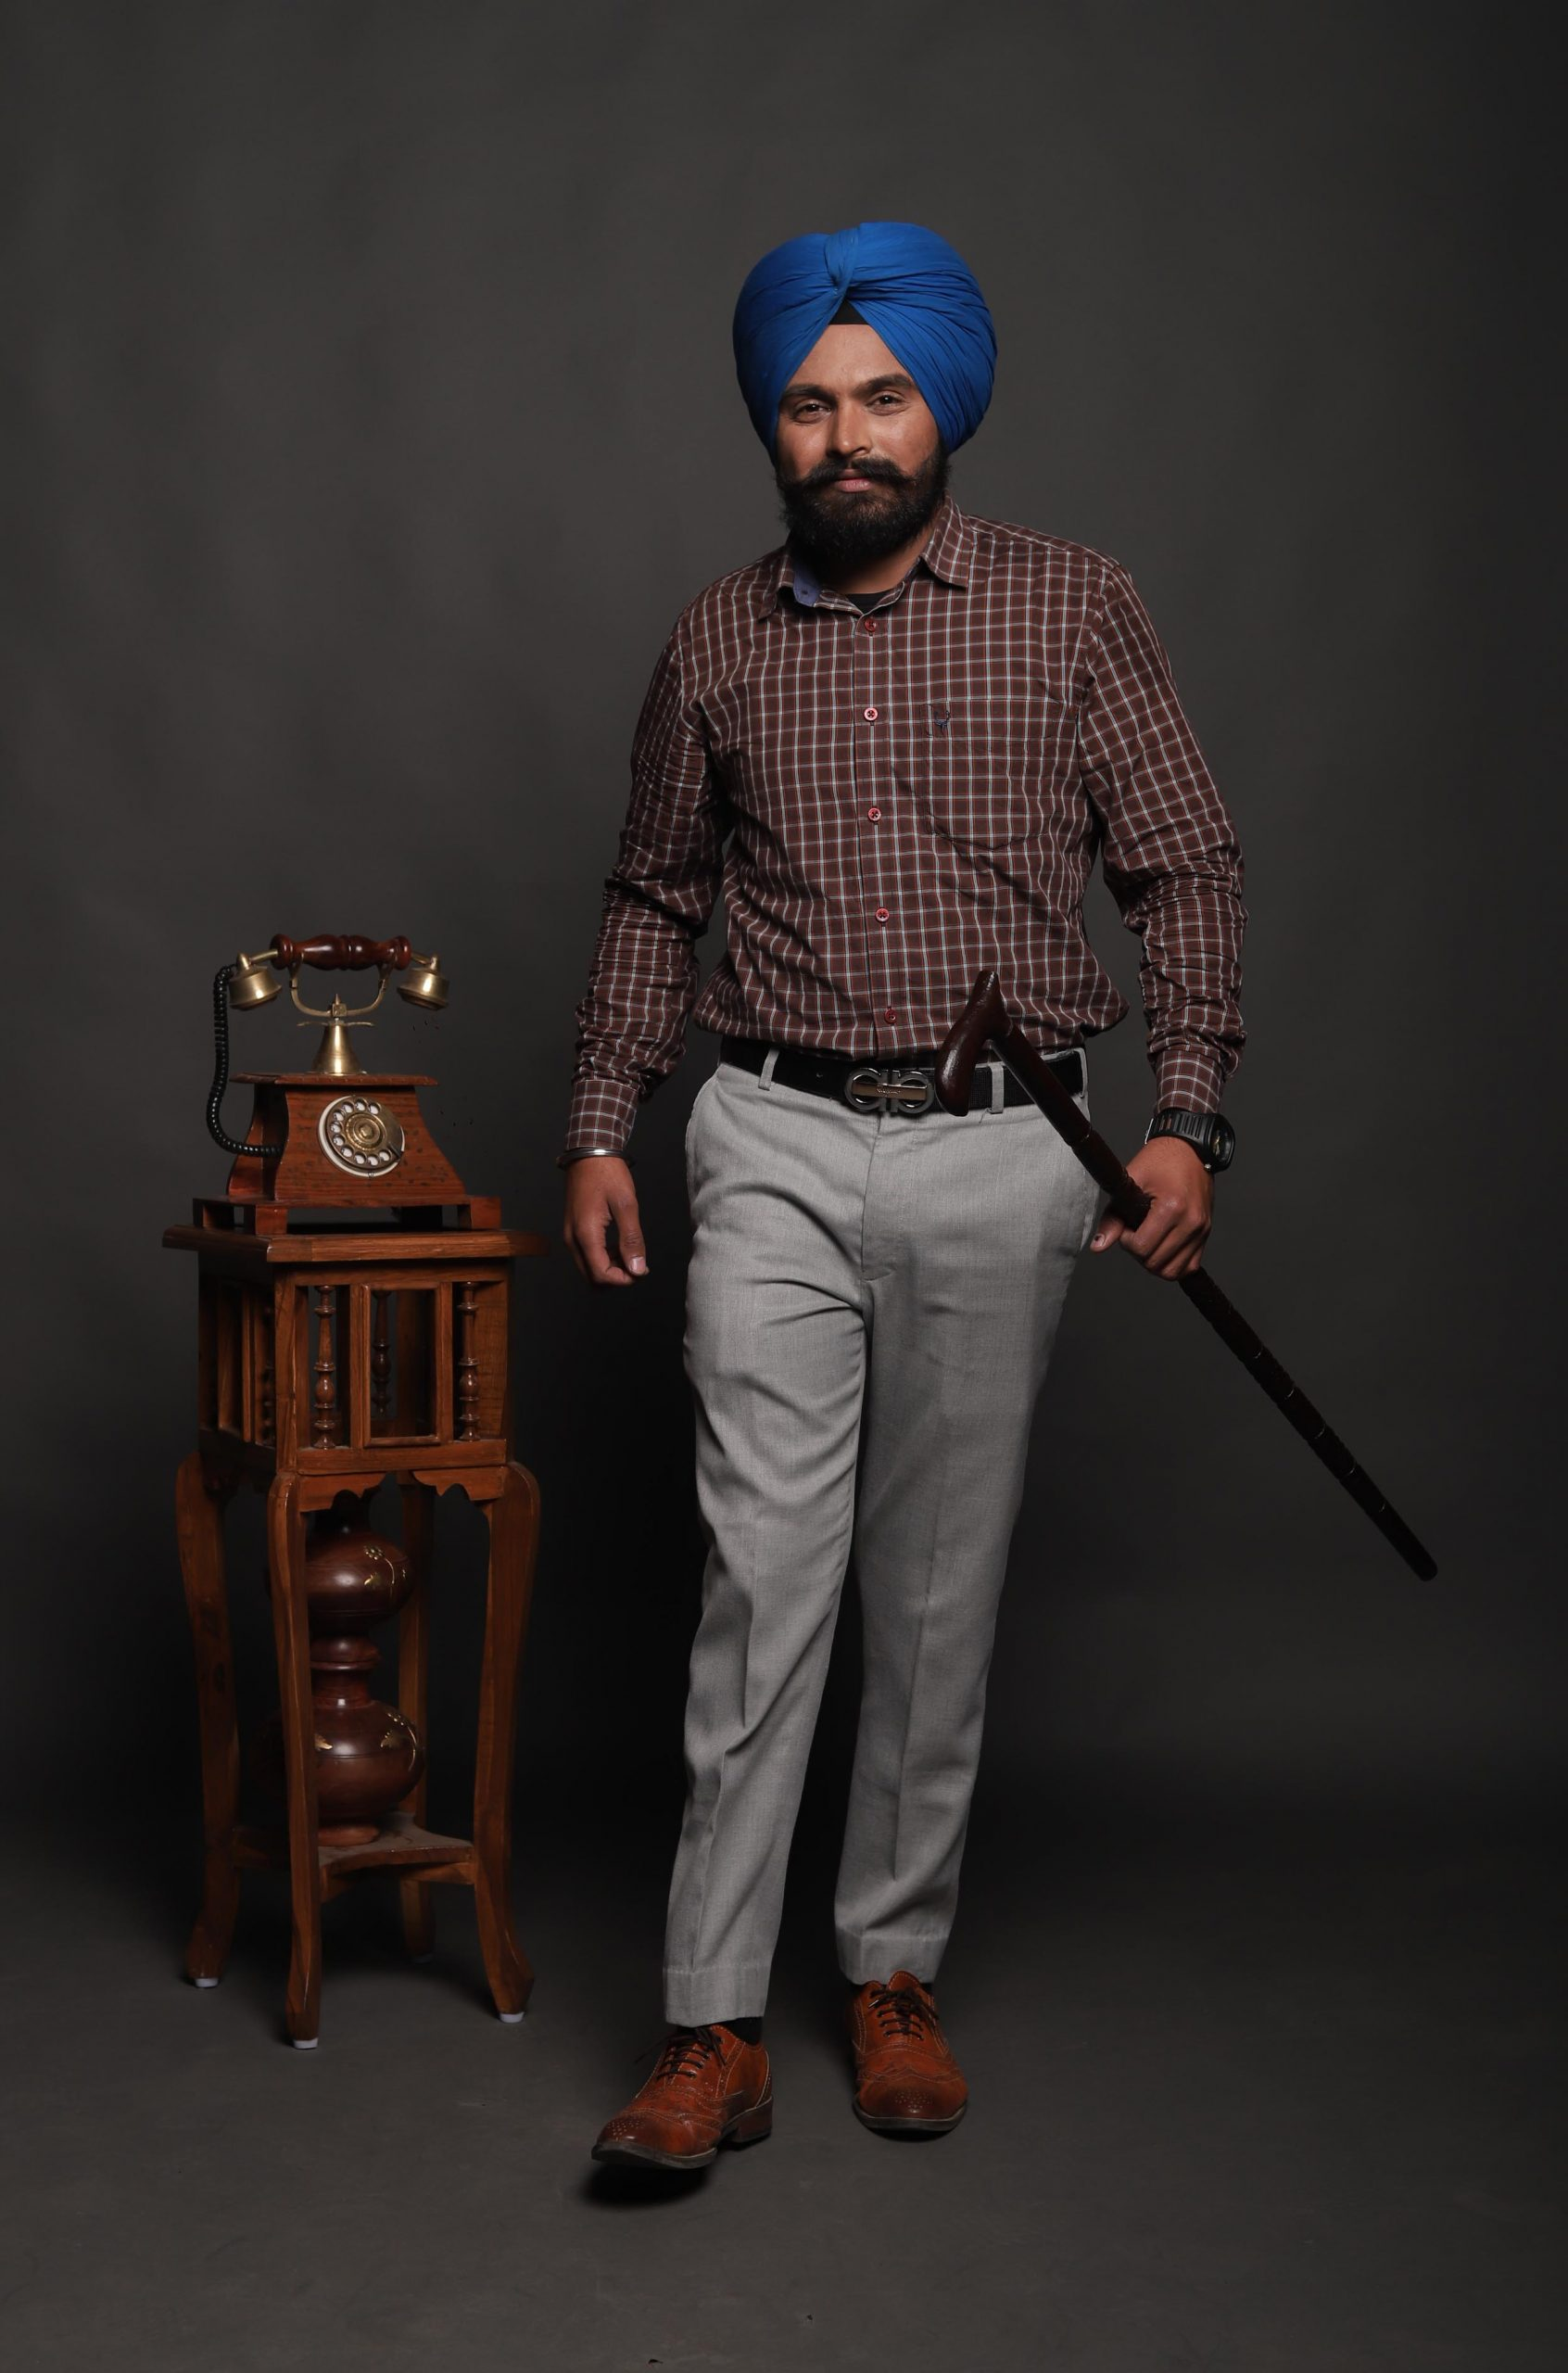 CTU bus conductor gets a break in Punjabi song as lead artist